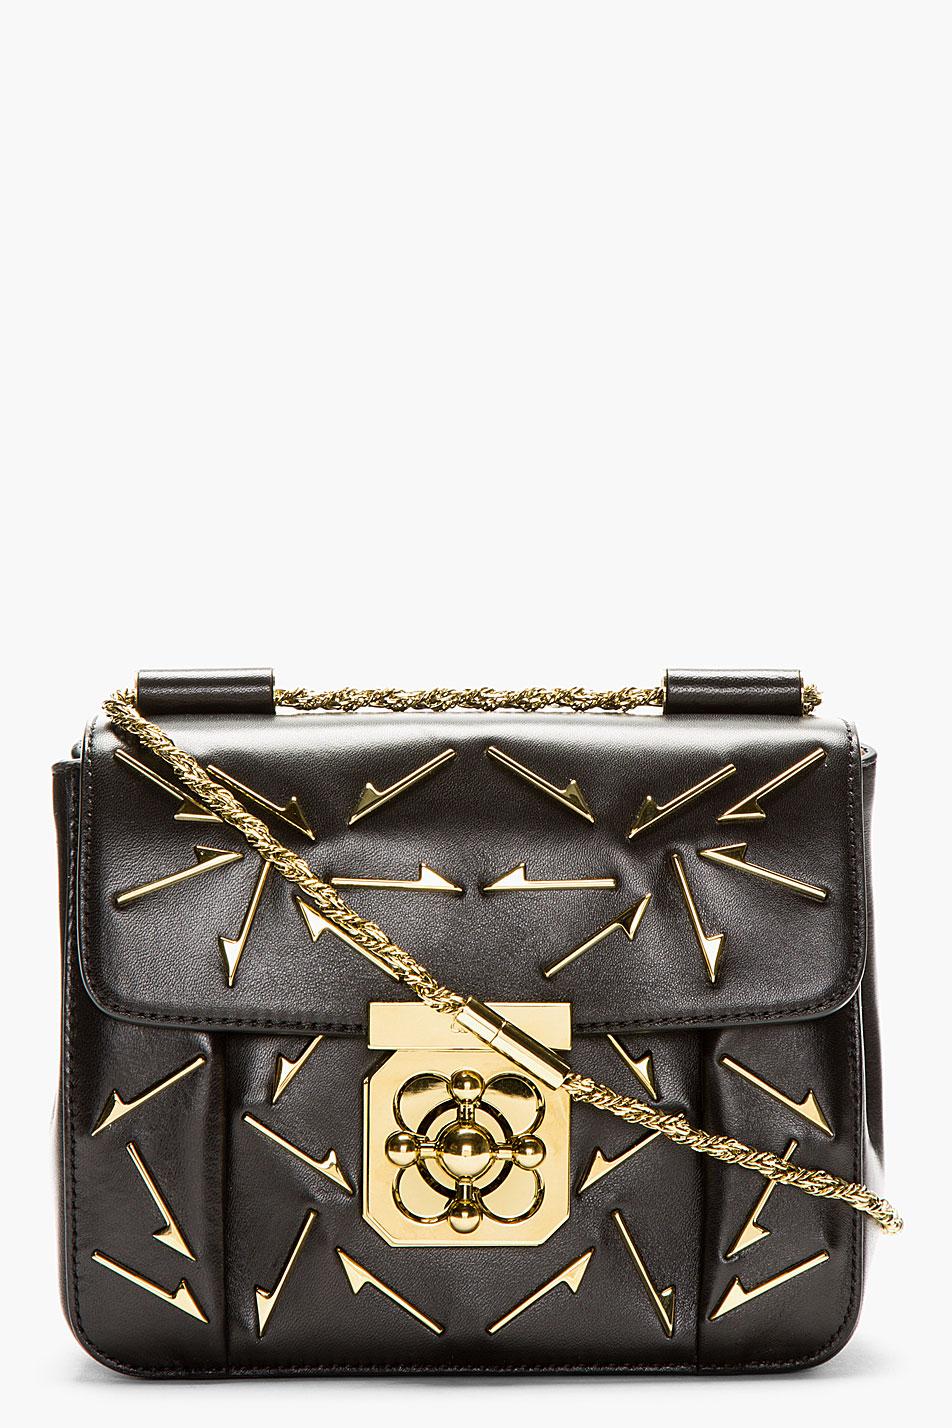 chloe python handbag - Chlo�� Black Leather Arrow Elsie Small Shoulder Bag in Black | Lyst